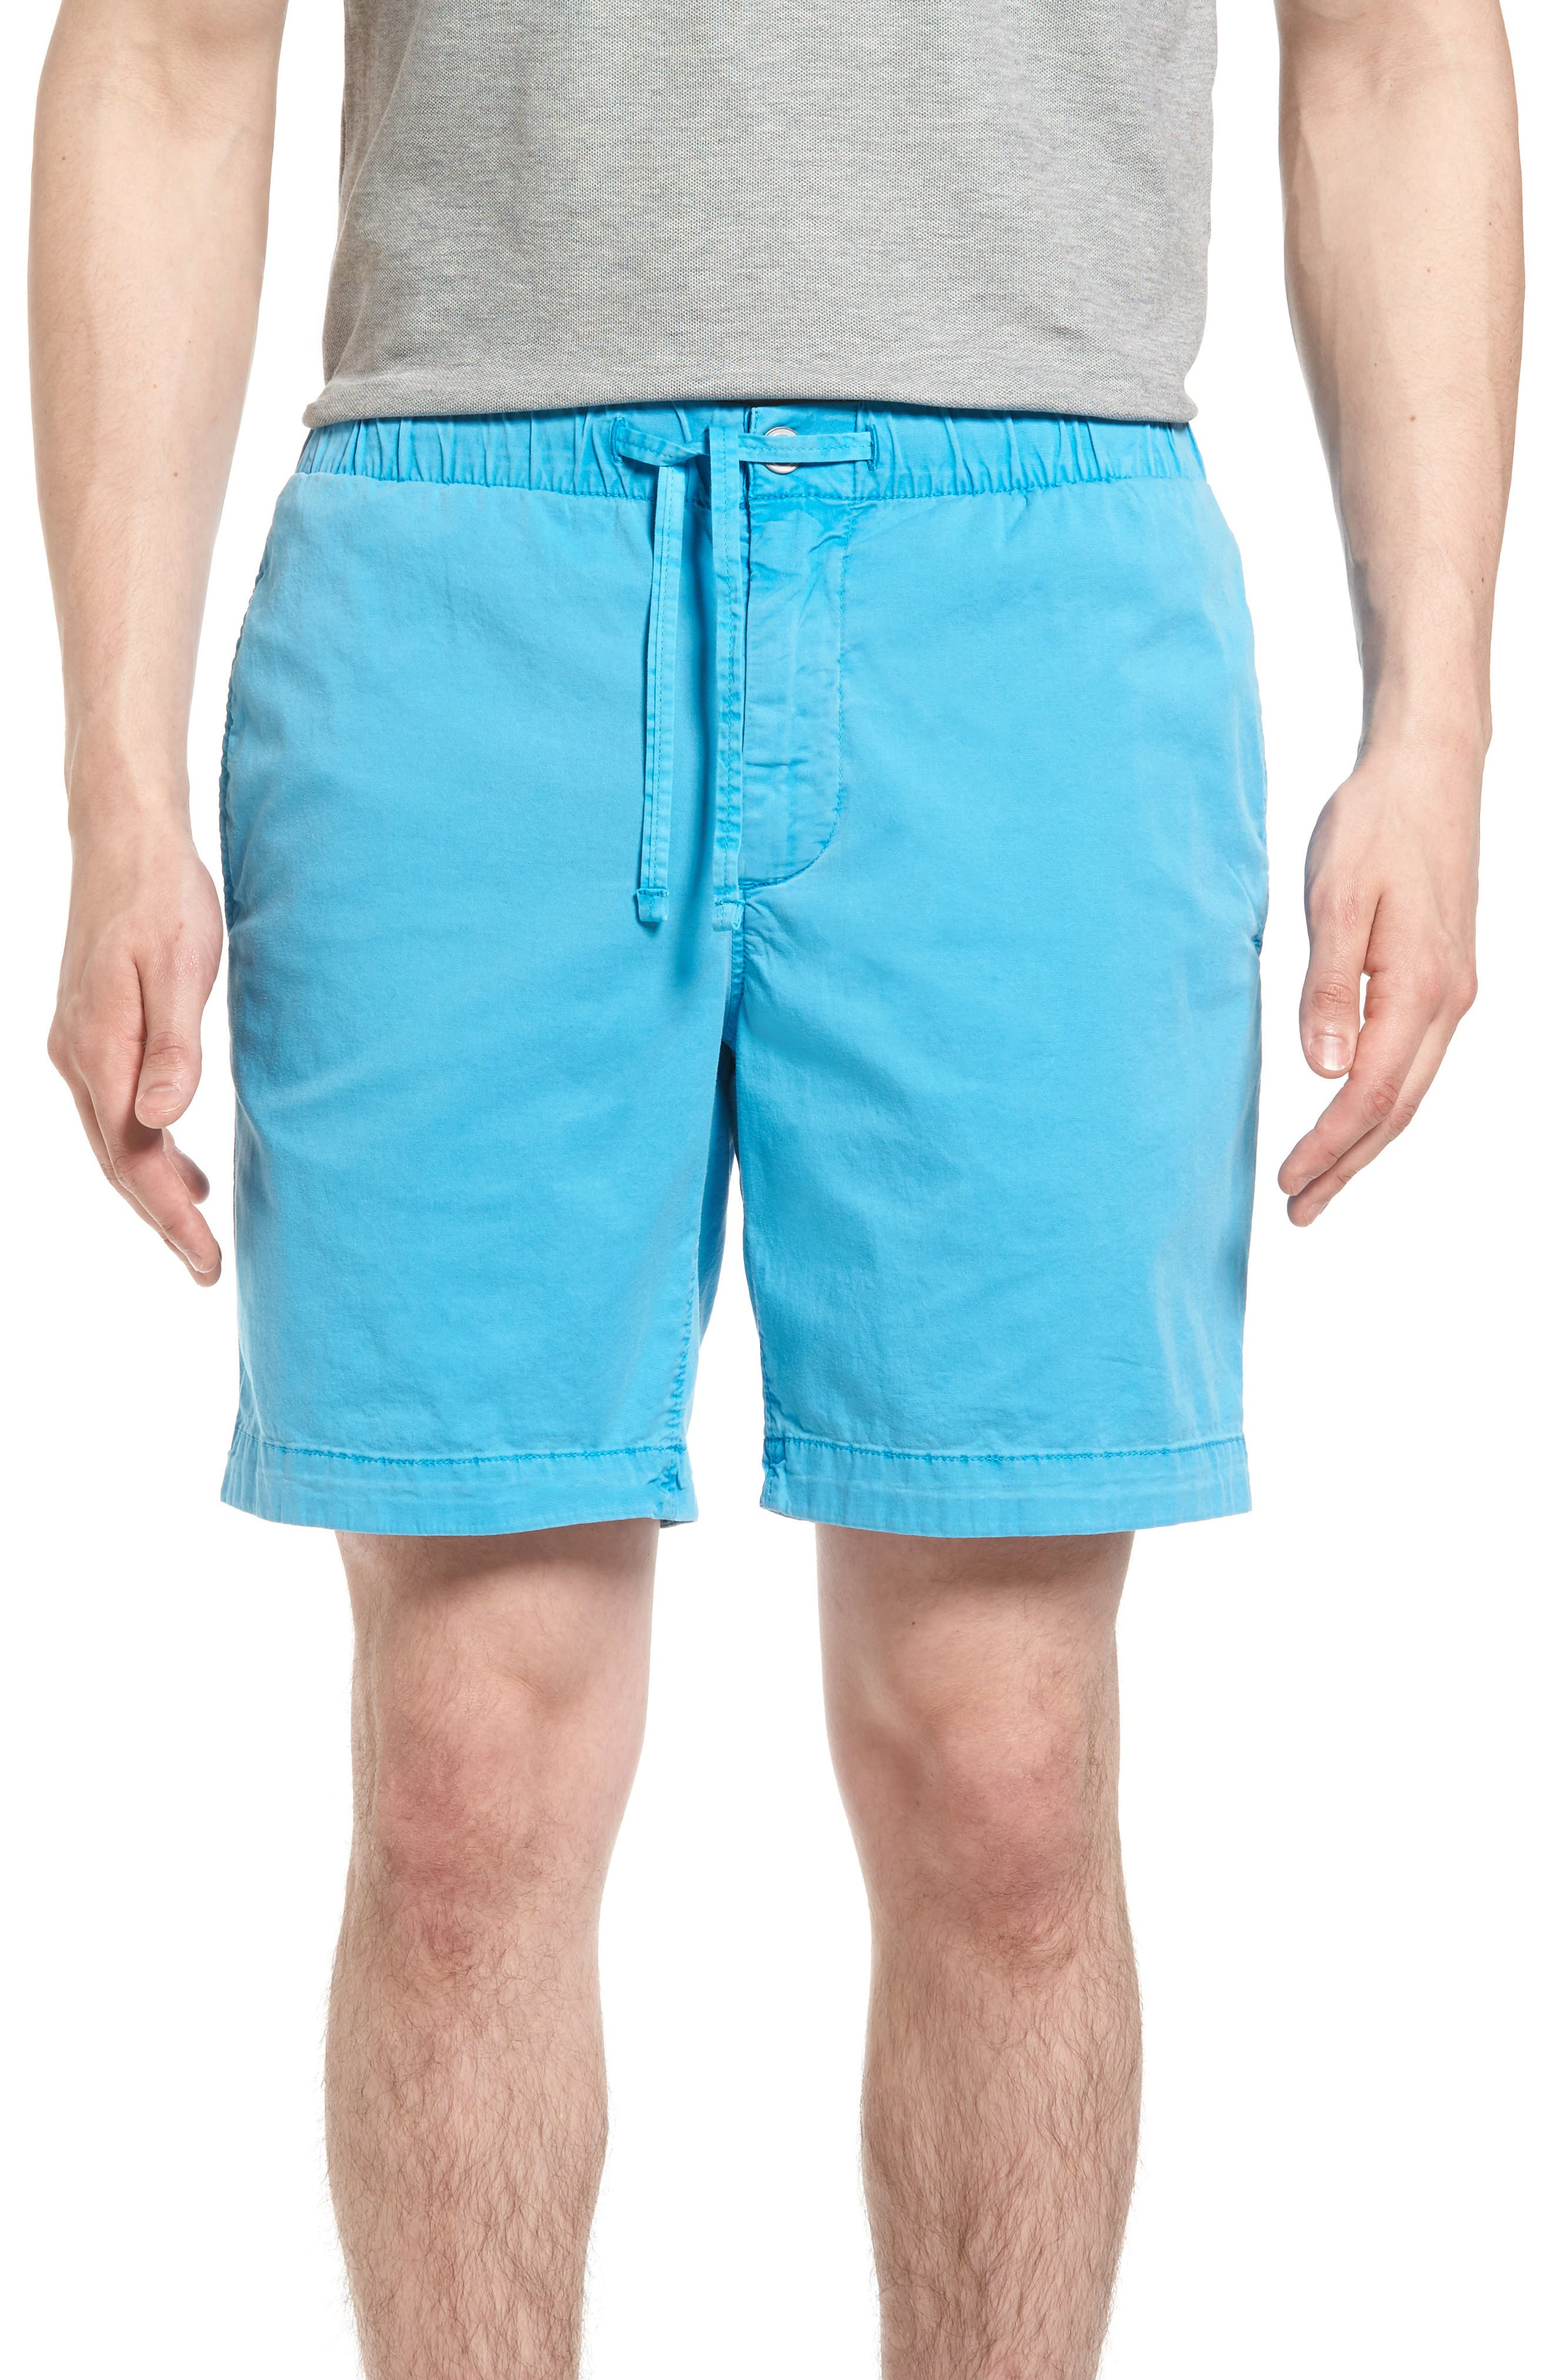 Alternate Image 1 Selected - Bonobos 7-Inch Beach Shorts